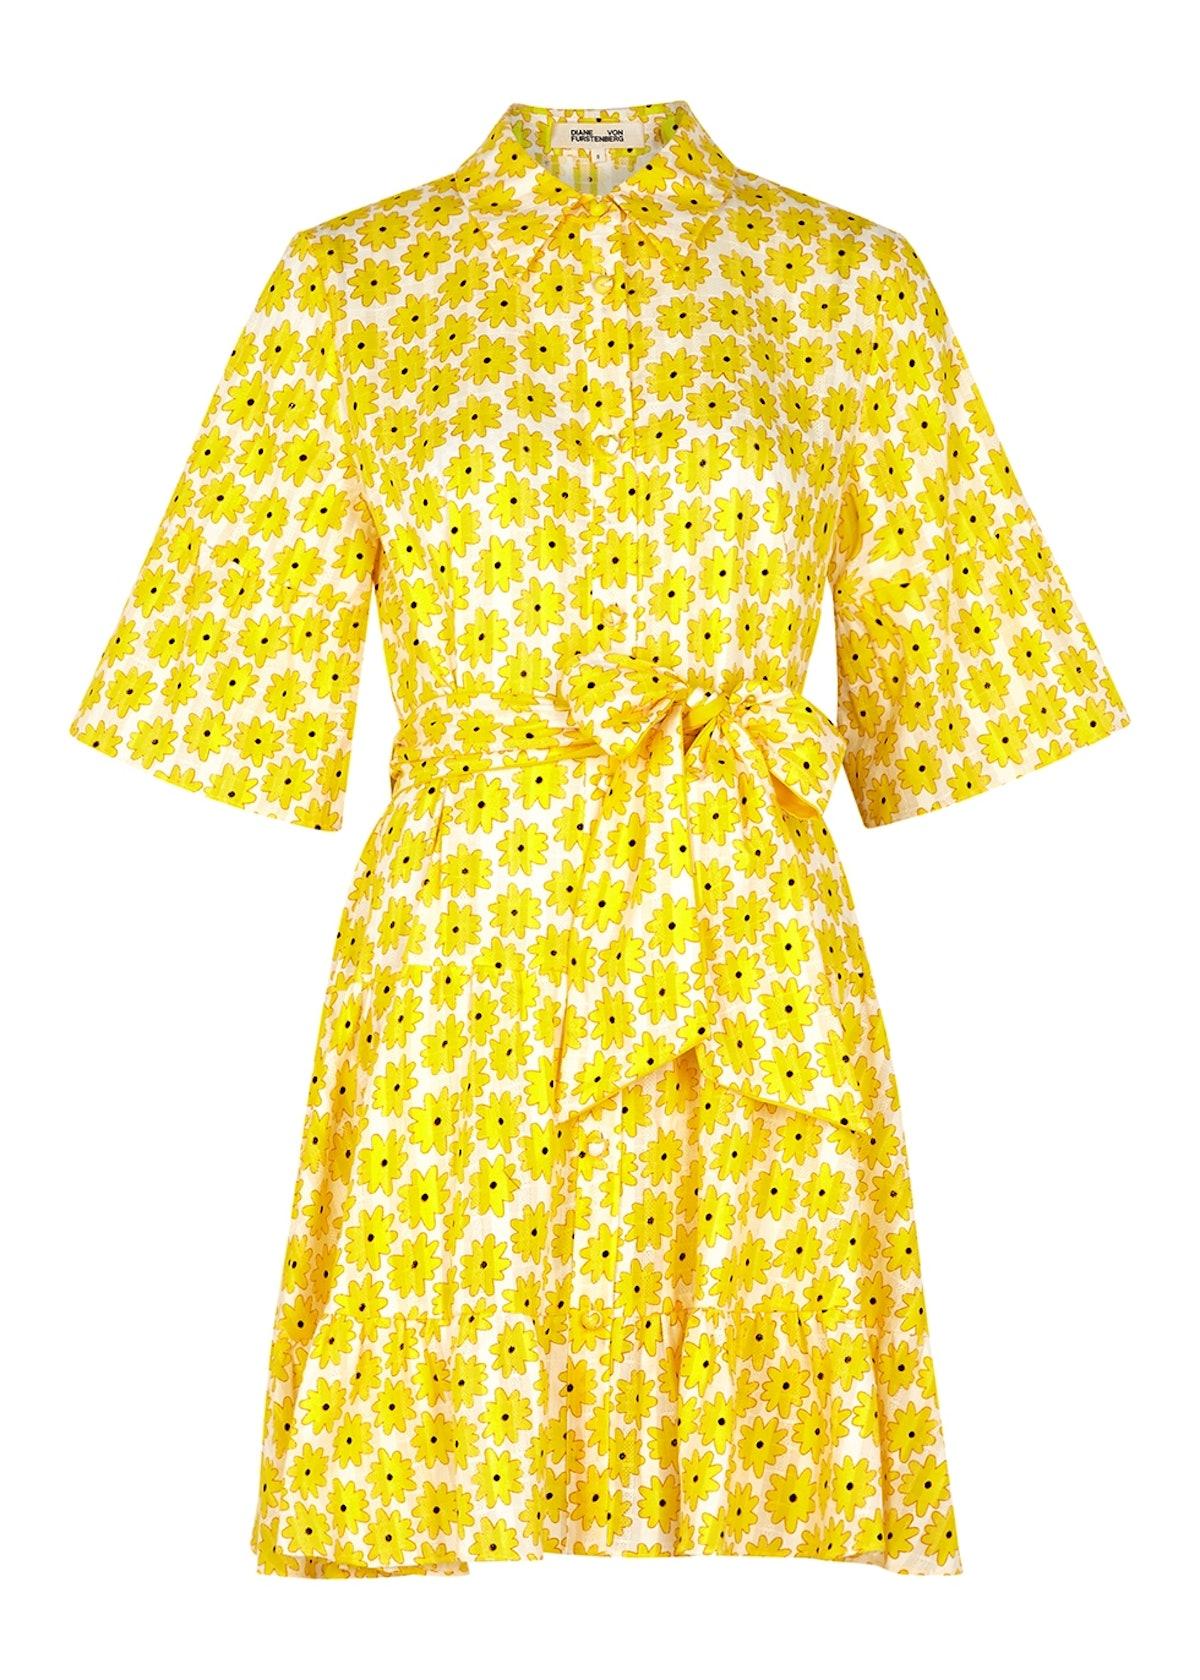 Beata floral-print cotton mini dress: image 1